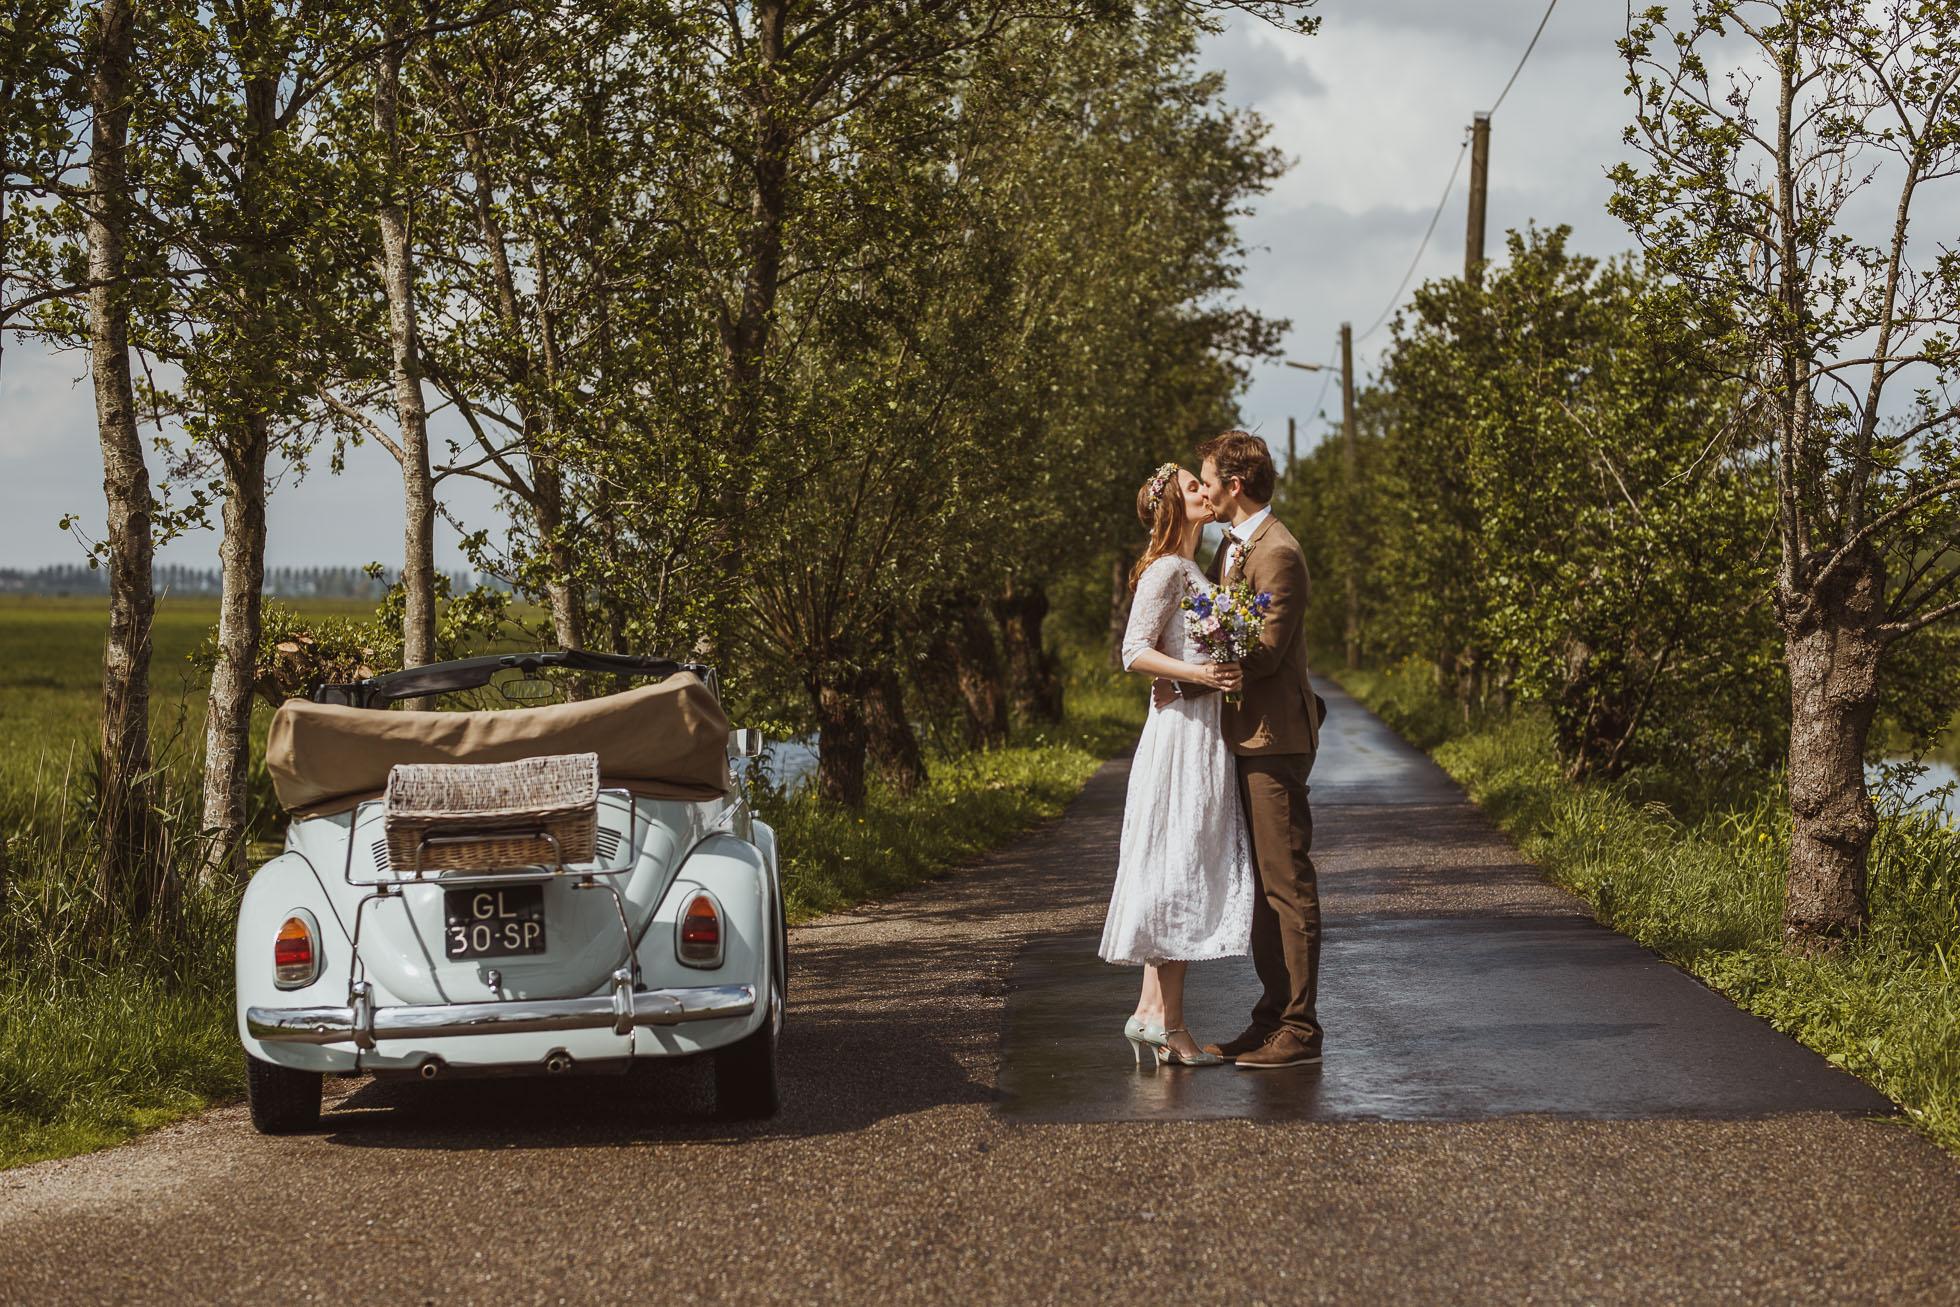 utrecht-wedding-photographer-29.jpg